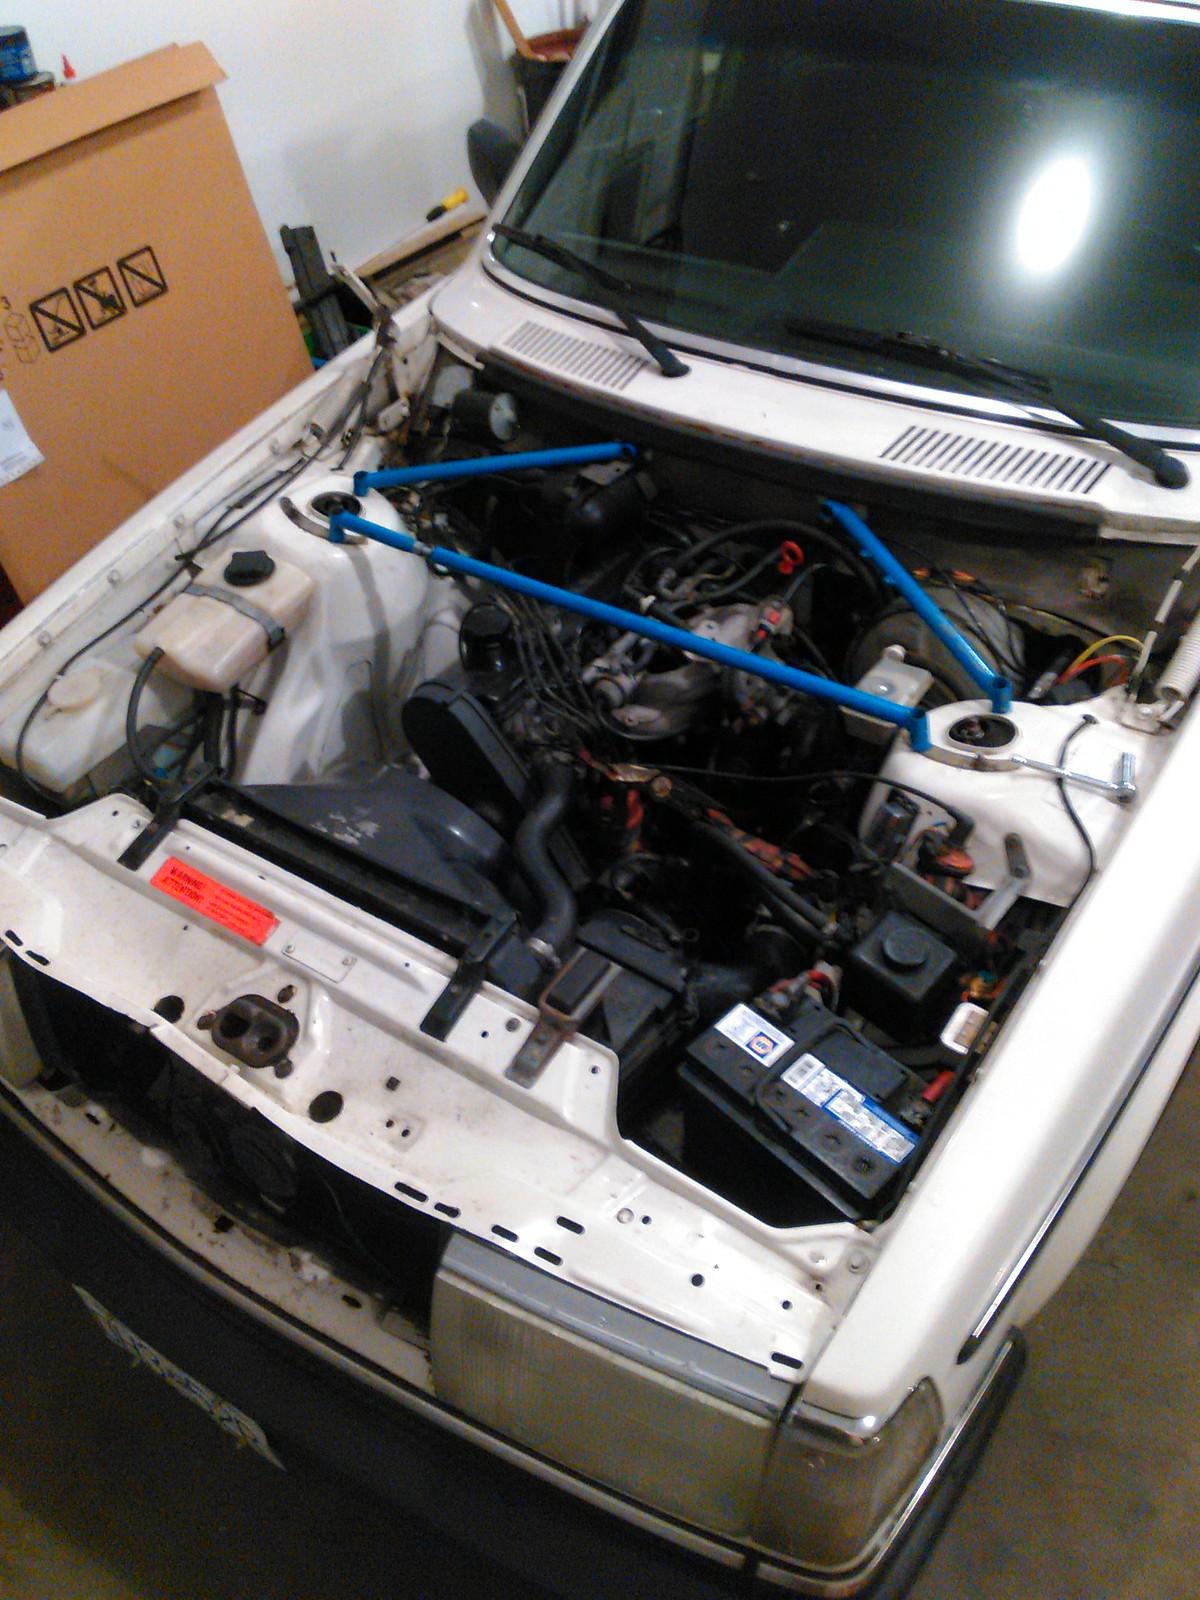 Diesel Daily: Volvo 245 Mitsubishi turbodiesel swap